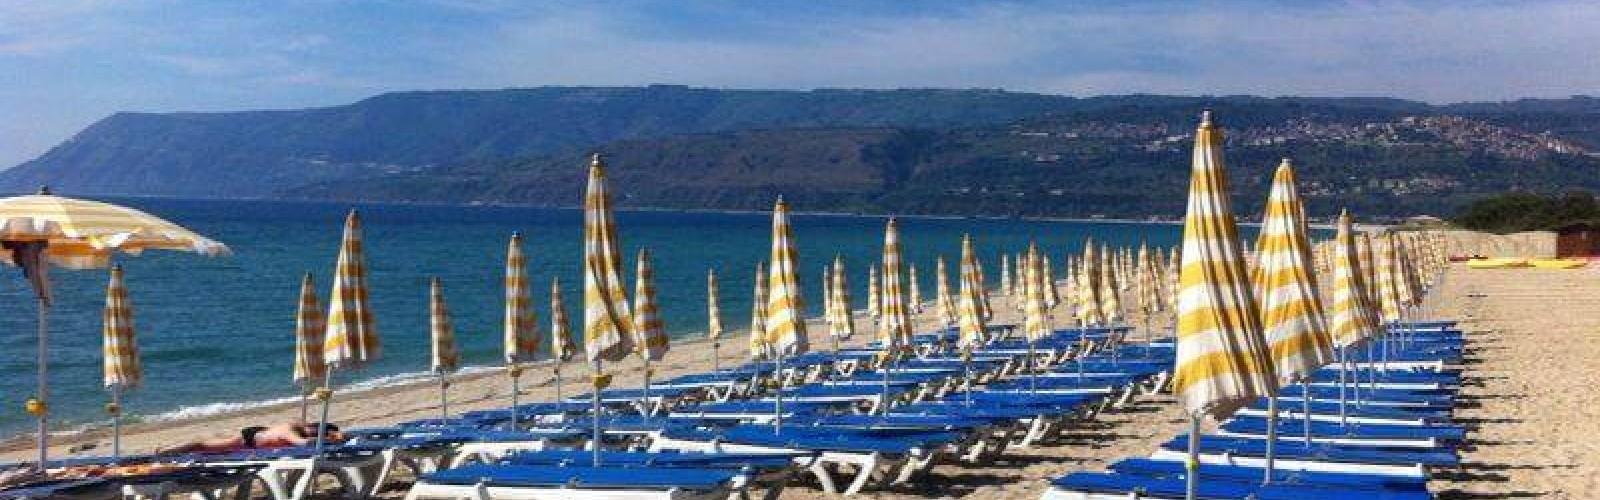 Nicotera Beache Village - Nicotera marina, Calabria - Spiaggia